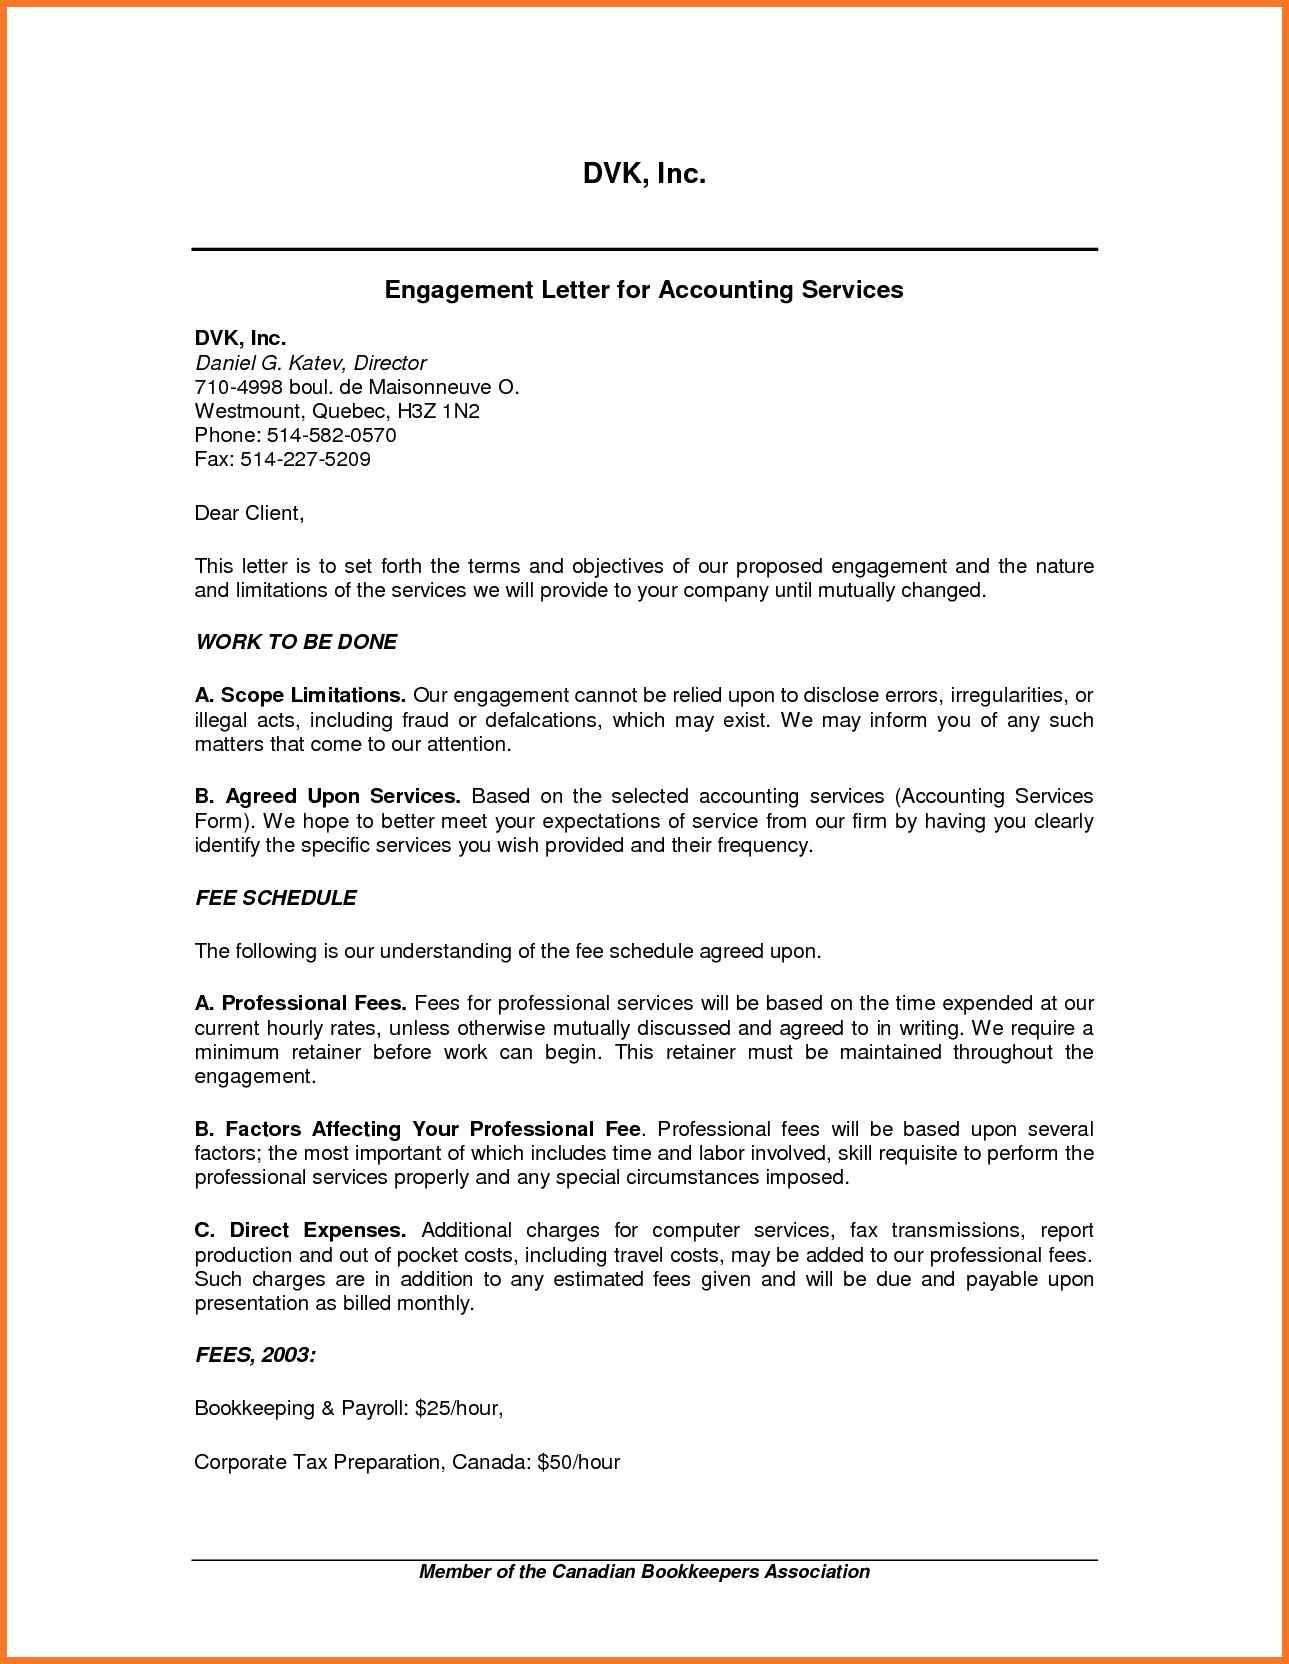 Letter Of Engagement Template Australia Refrence Tax Preparation With Letter Of Engagement Bookkeeping Template Australia